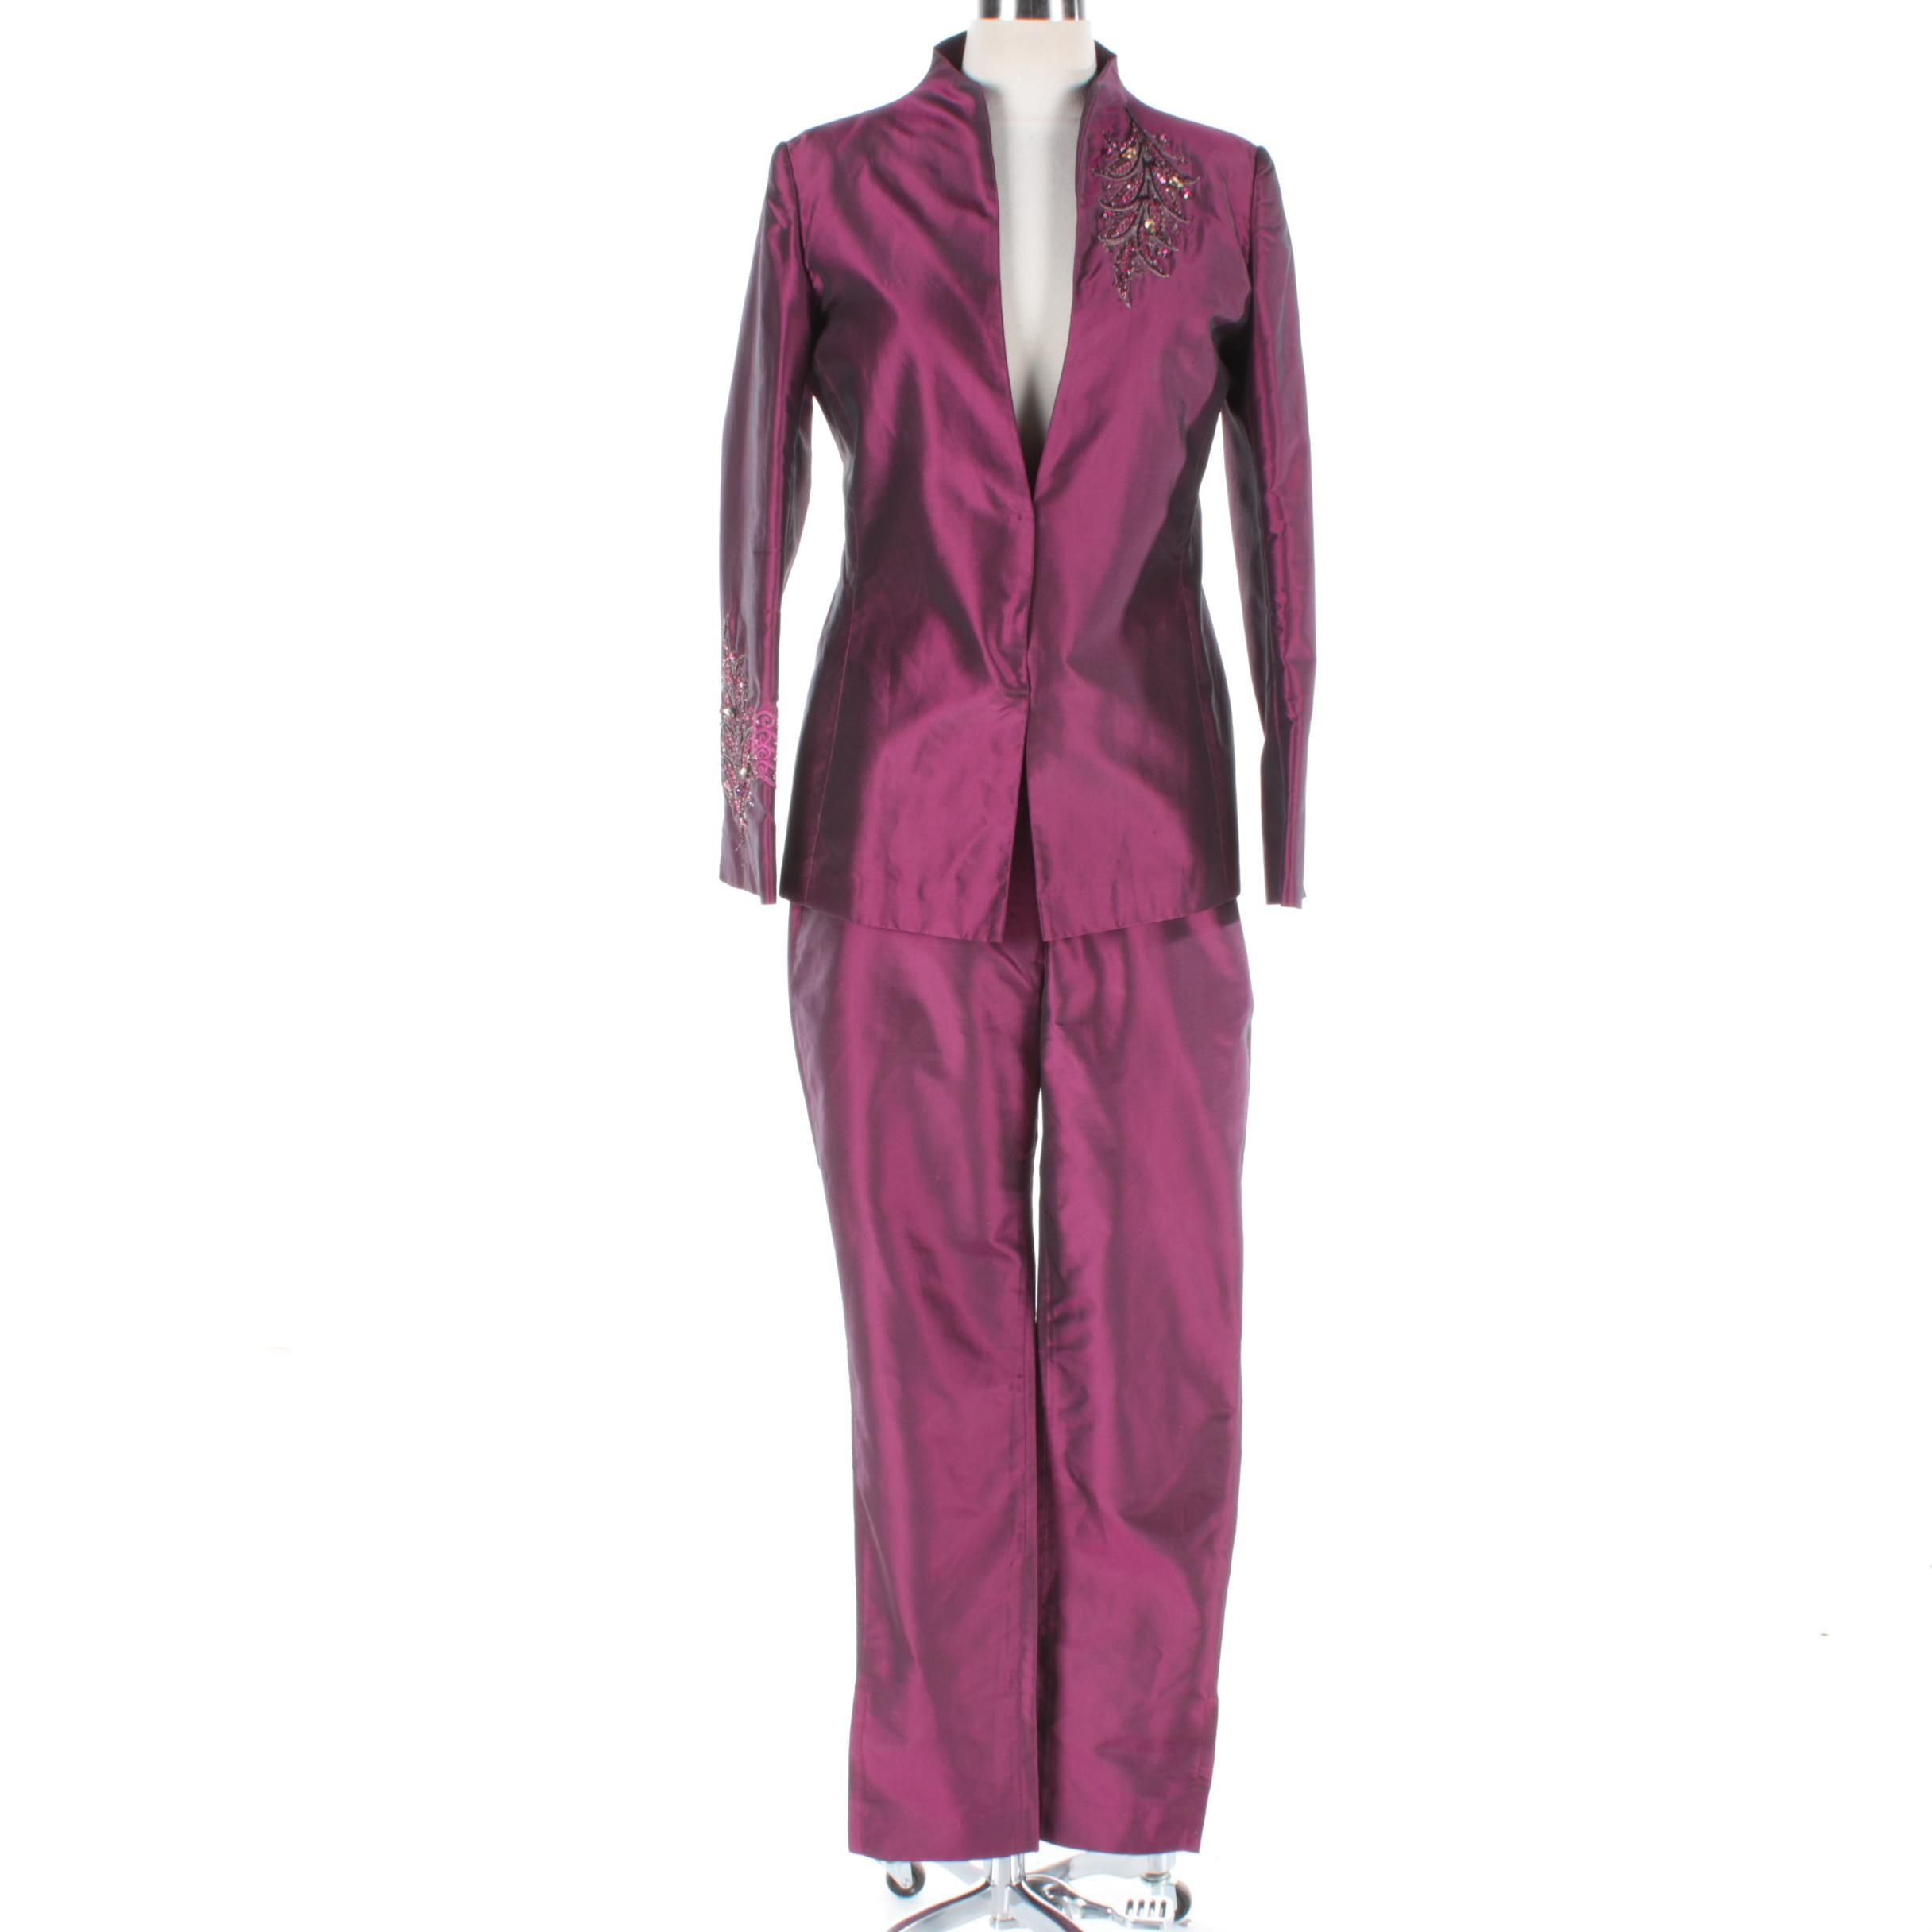 Women's Narendra Kumar Iridescent Satin Embellished Pantsuit